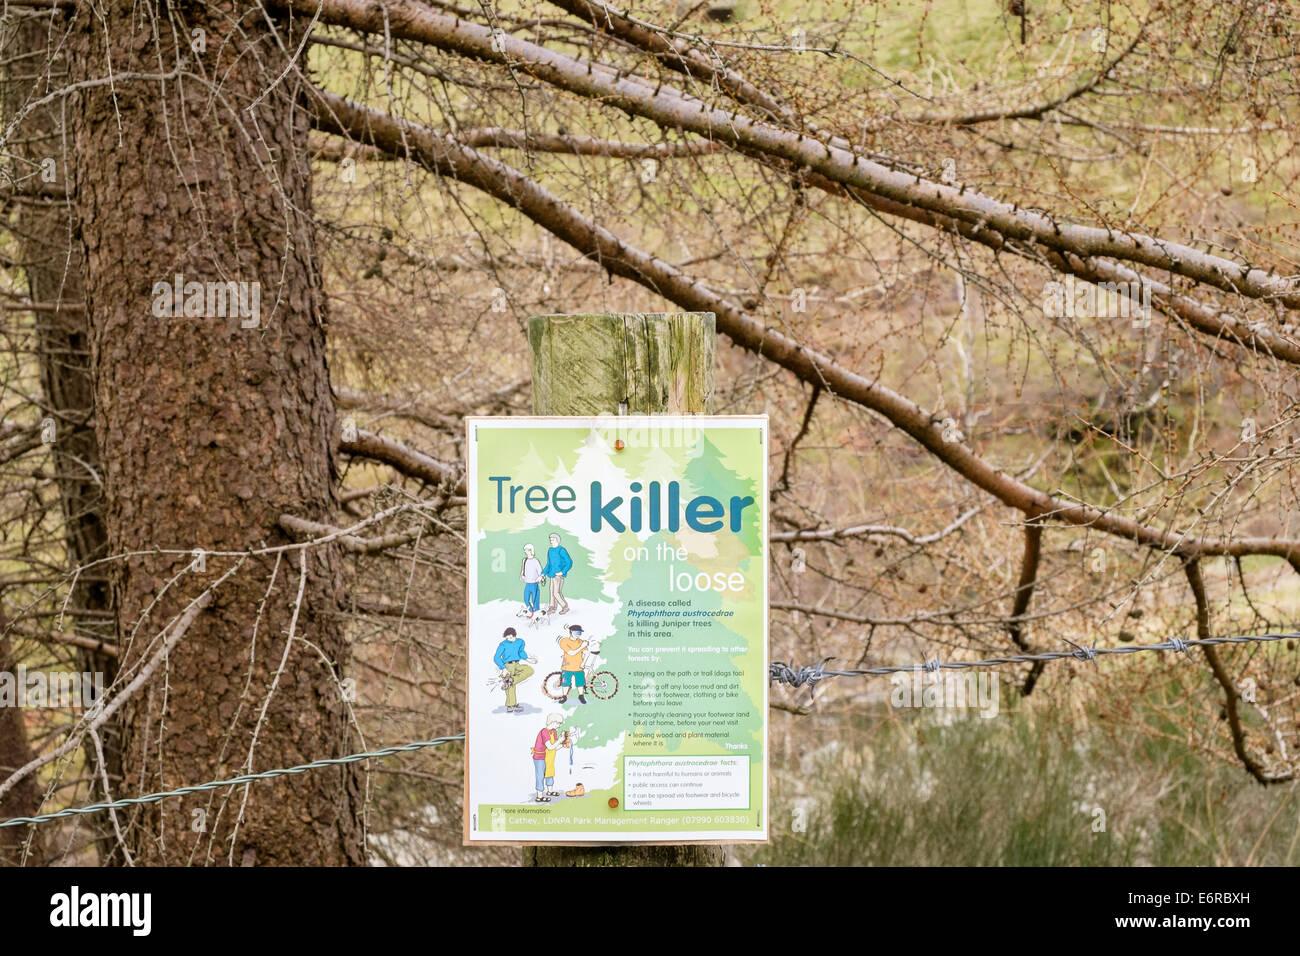 Sign warning of tree killer Phytophthora austrocedrae disease killing Juniper trees in Lake District National Park - Stock Image